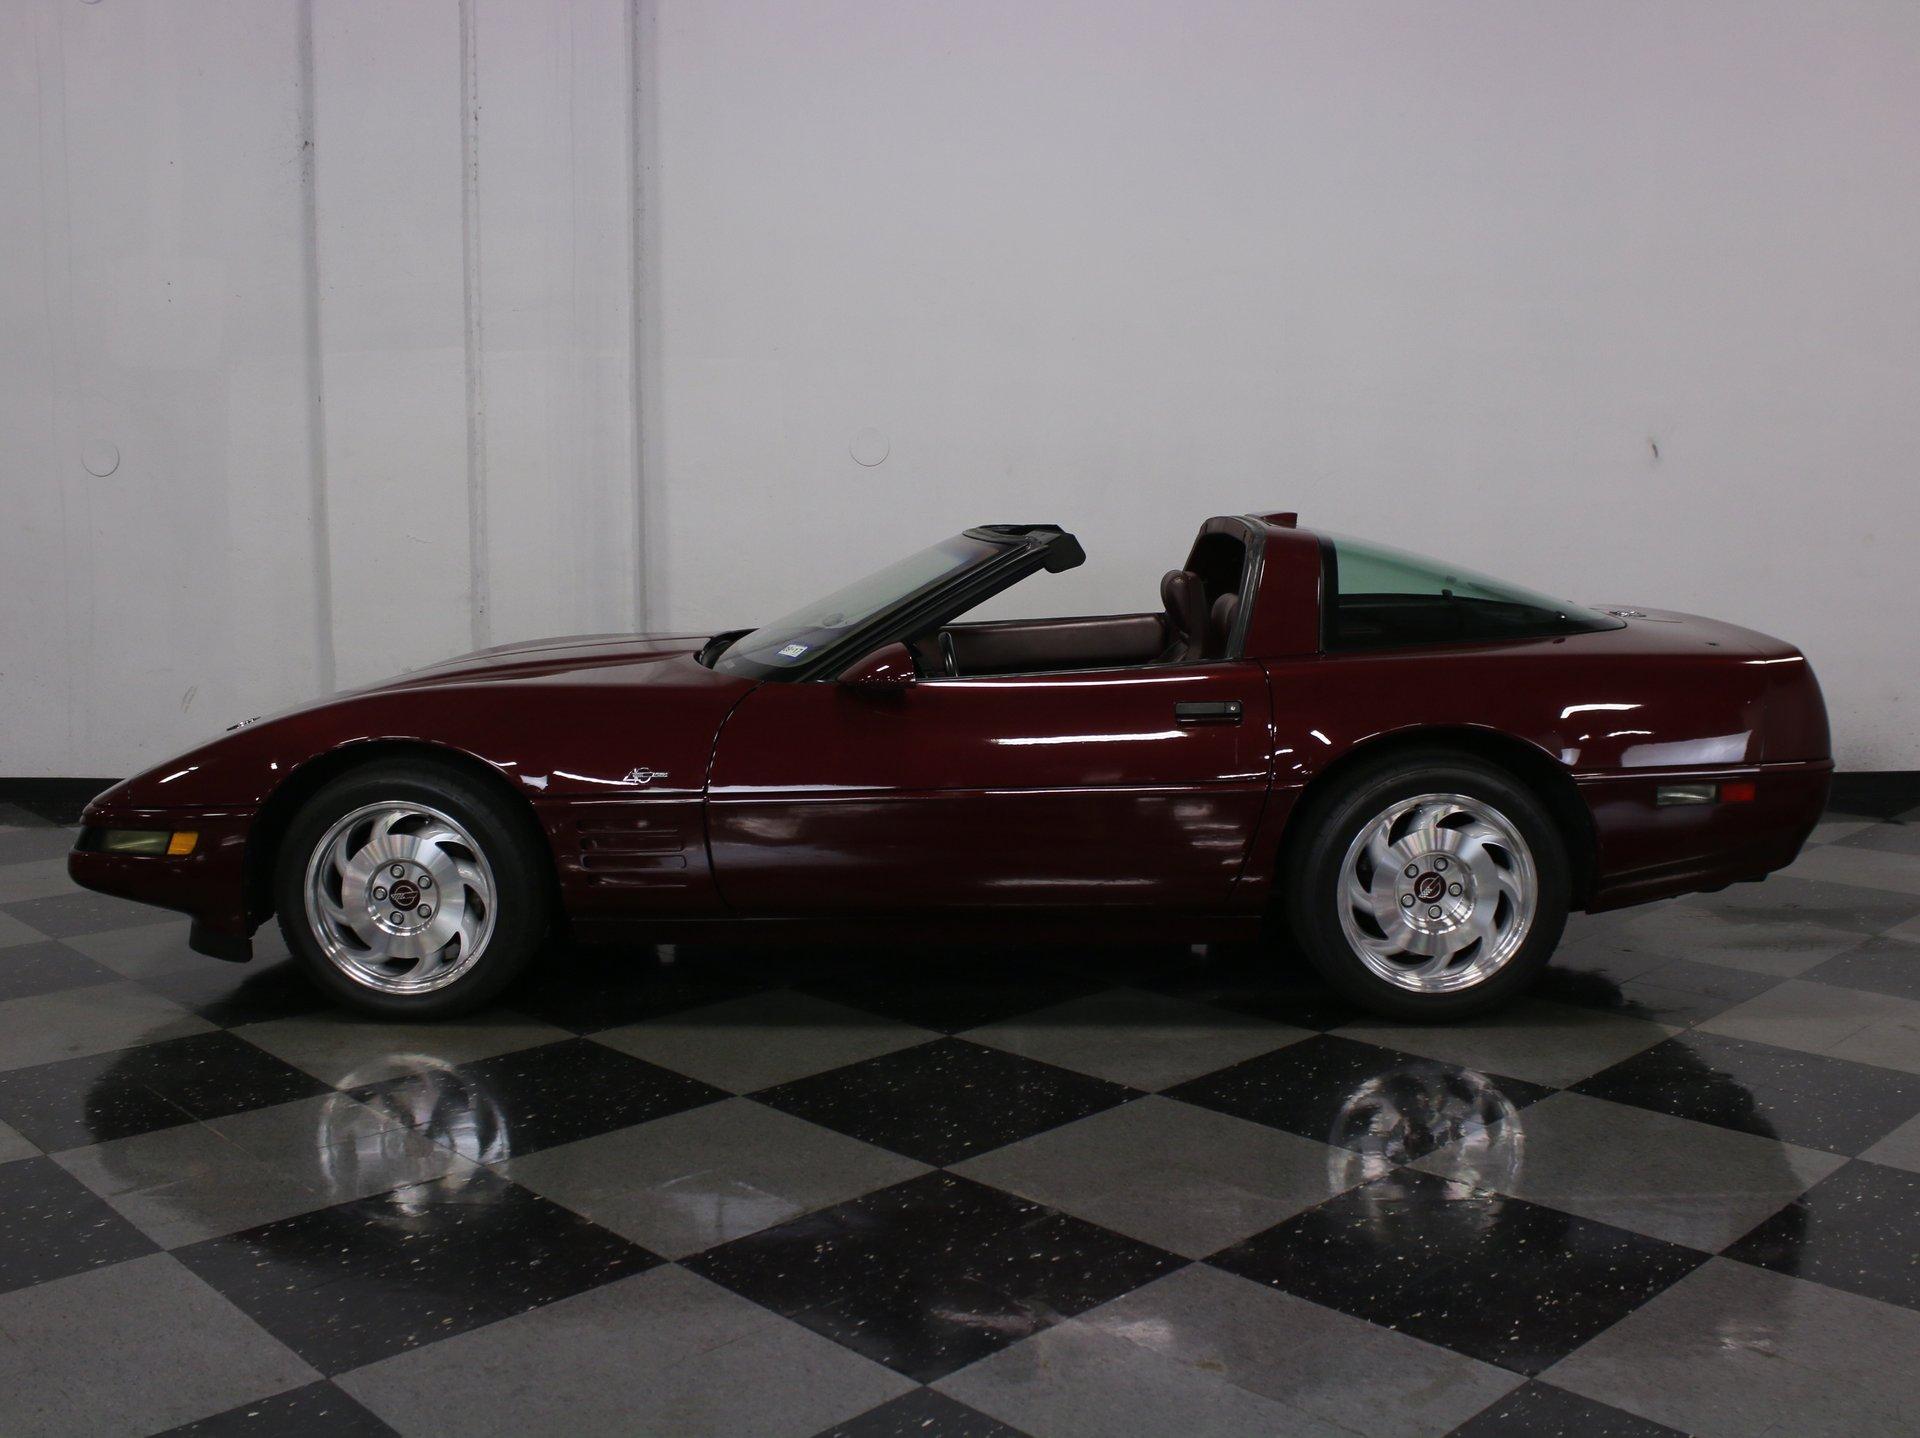 1993 chevrolet corvette zr 1 40th anniversary